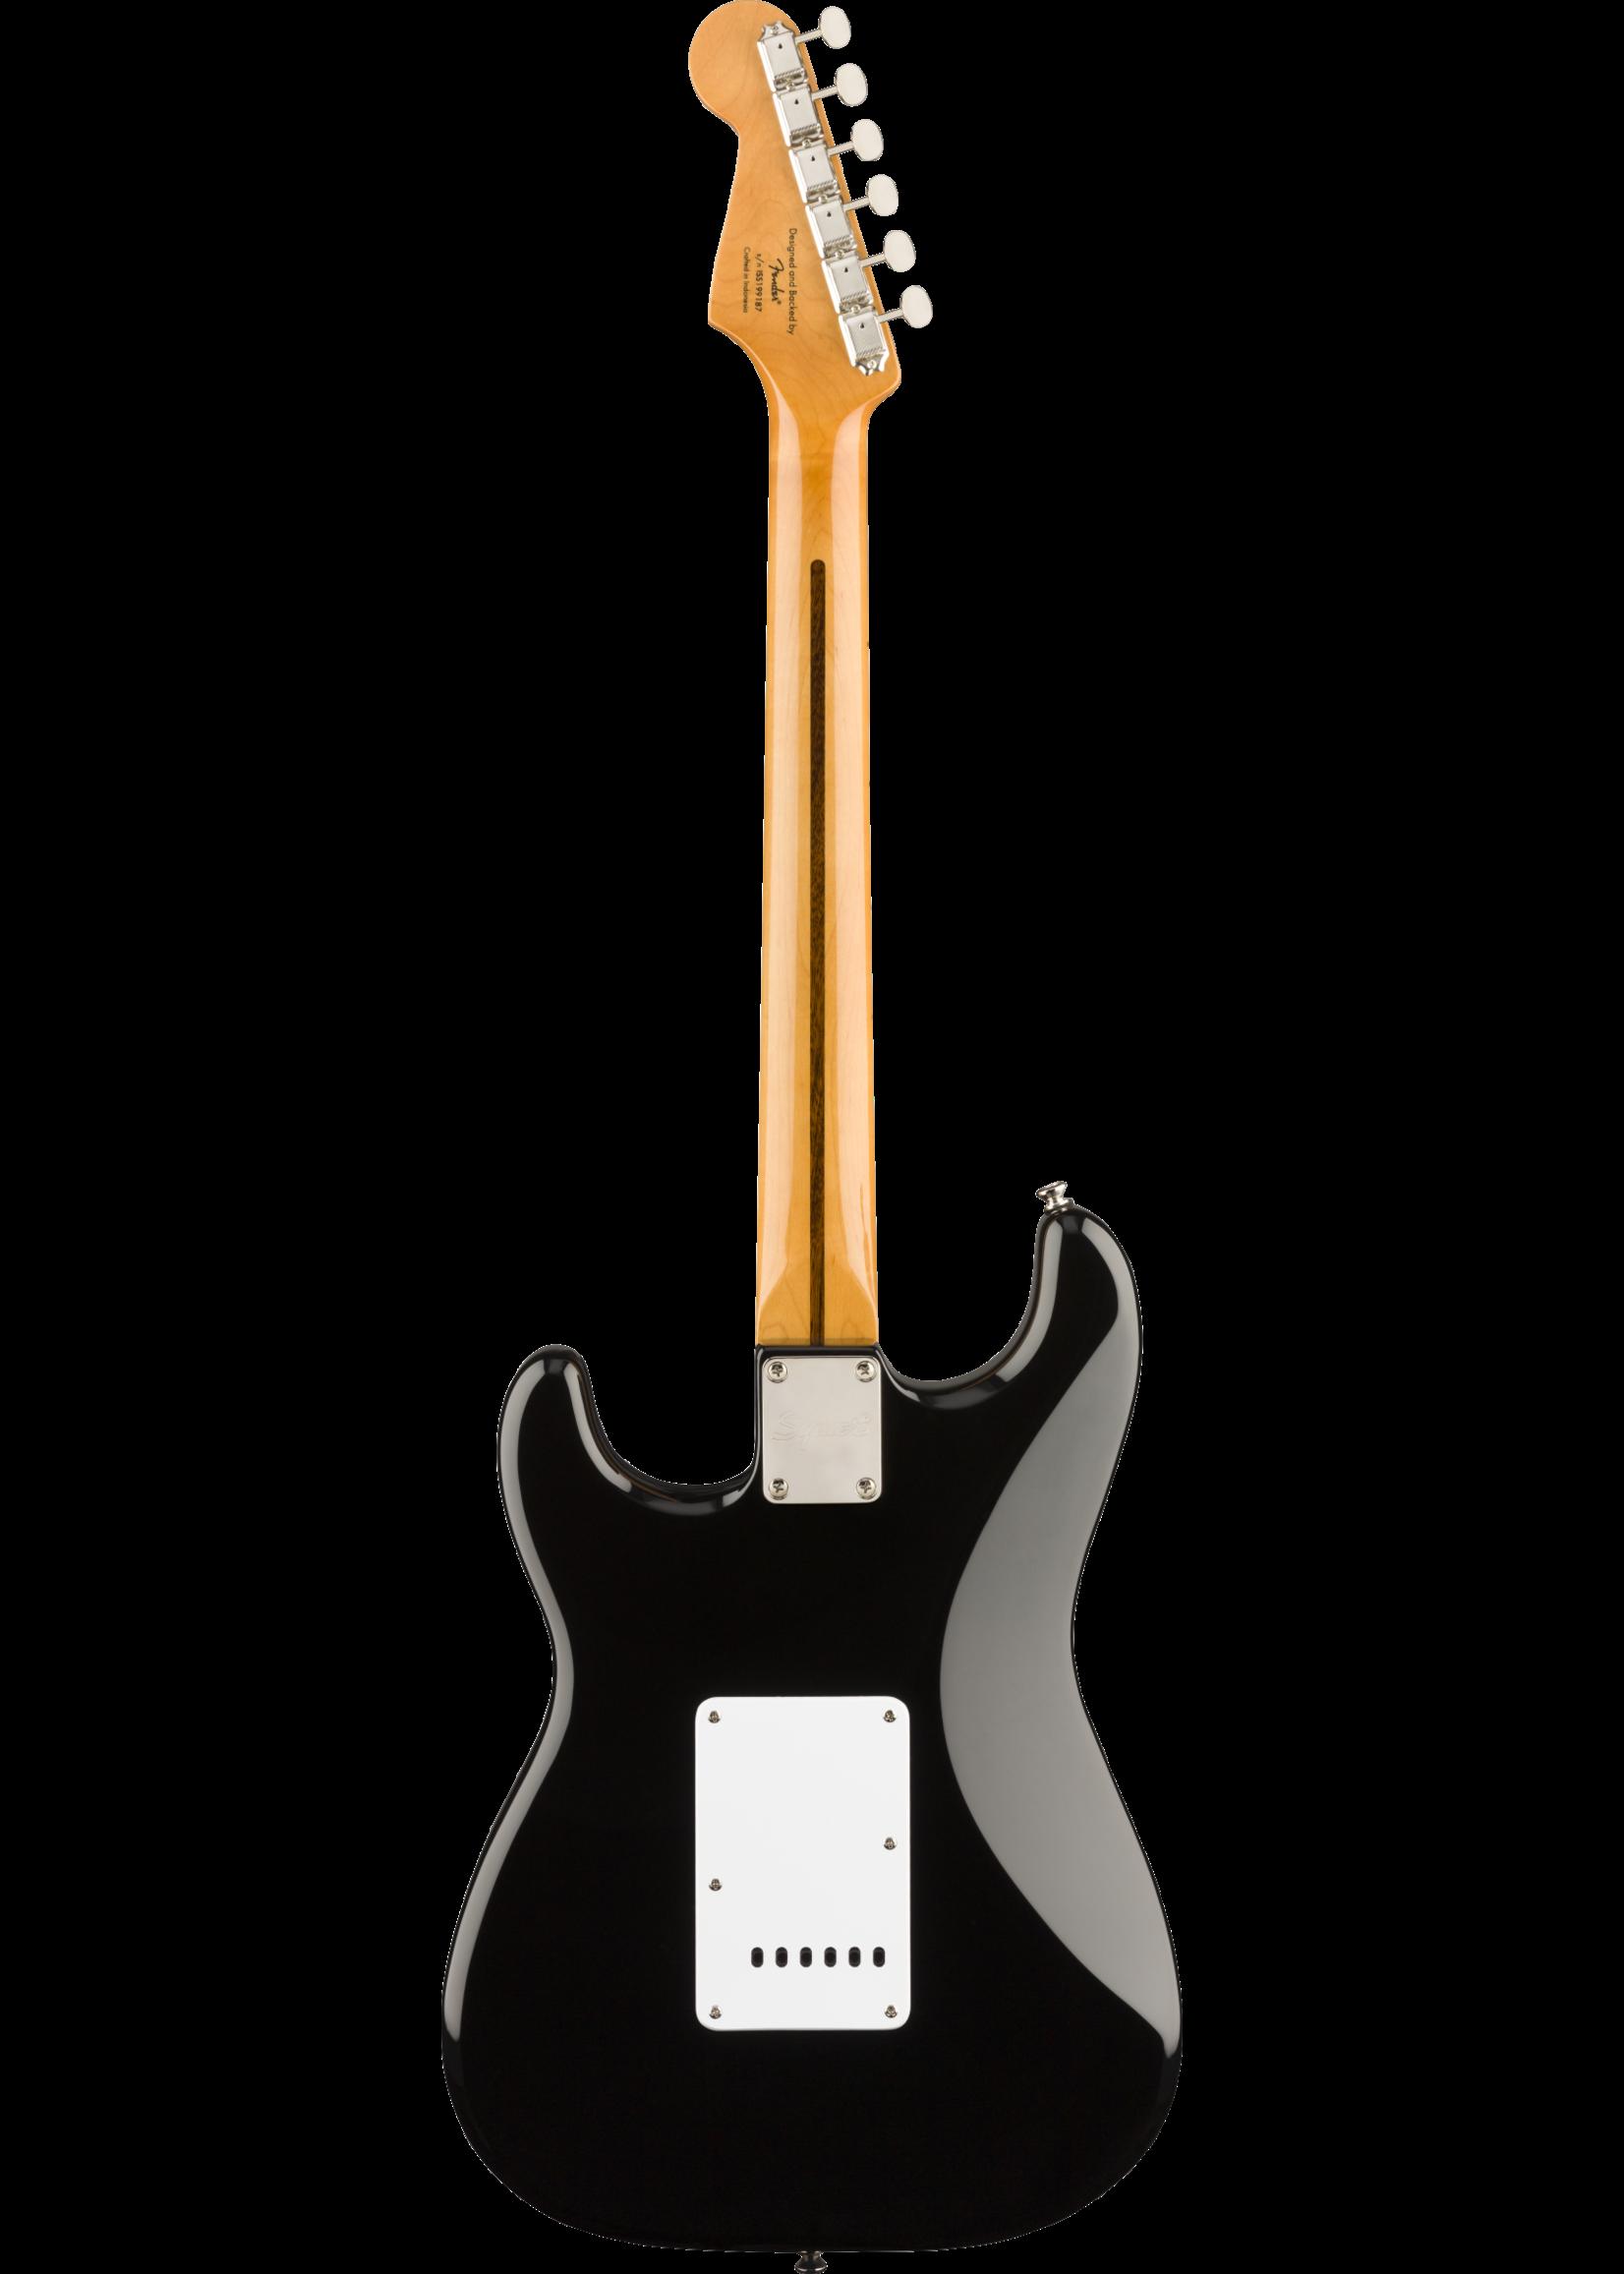 Squier Squier Classic Vibe '50s Stratocaster Black